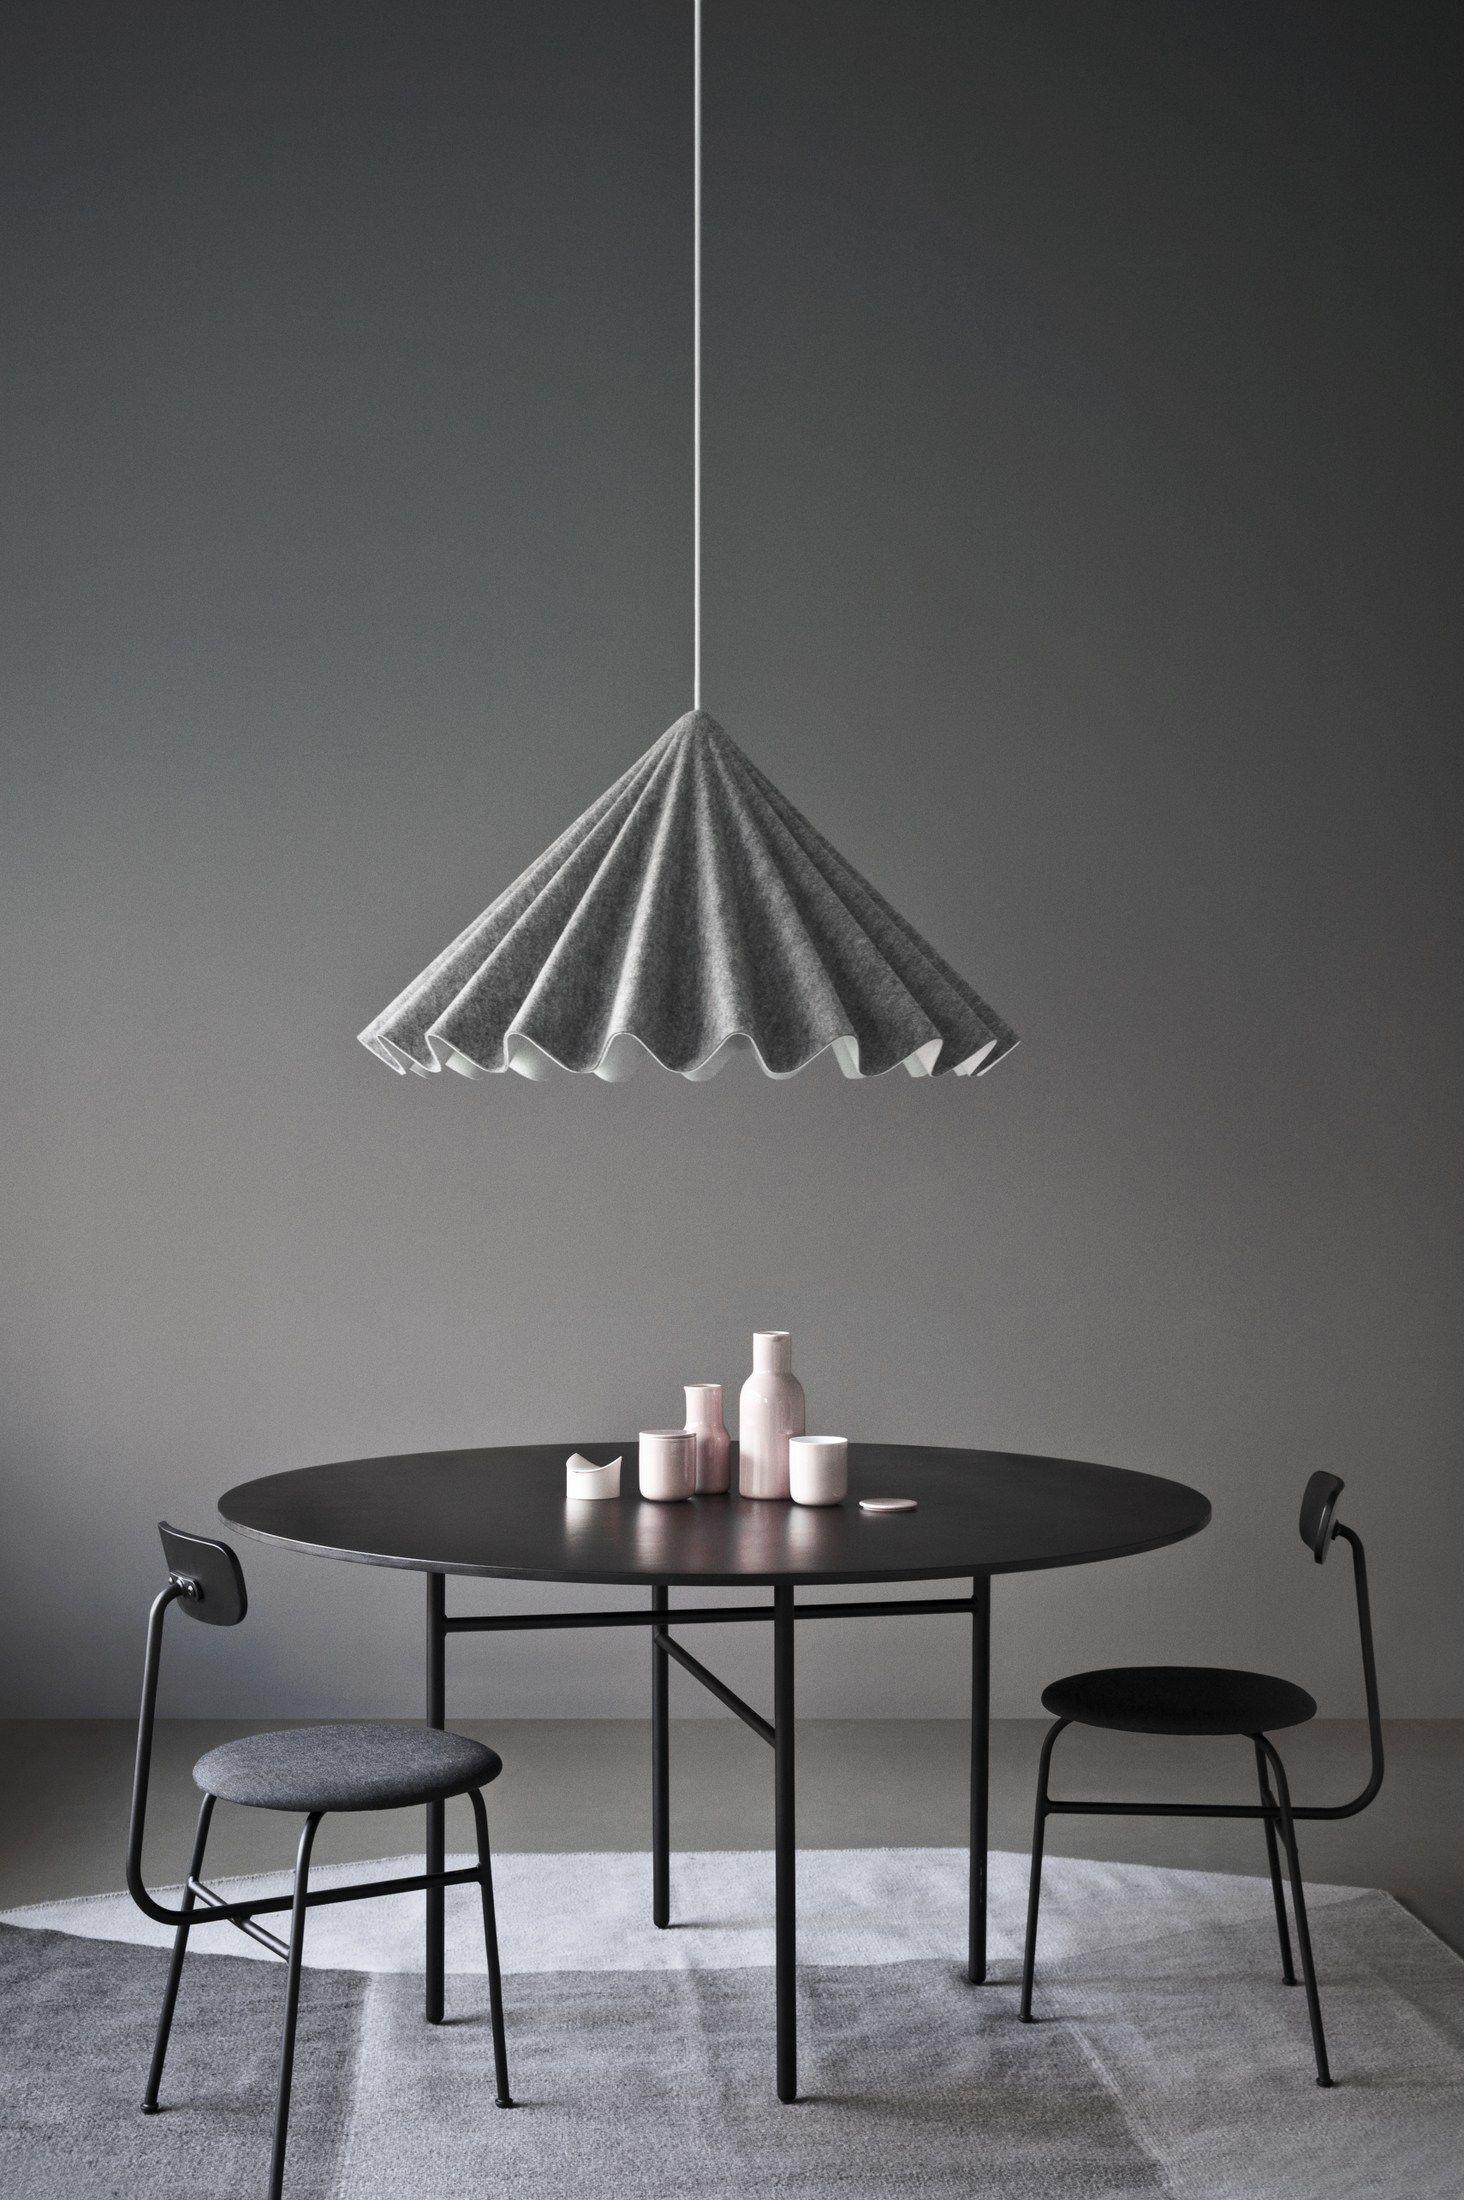 Dancing Pendant Lamp By Menu Sohomod Blog Round Dining Table Round Dining Minimalist Furniture